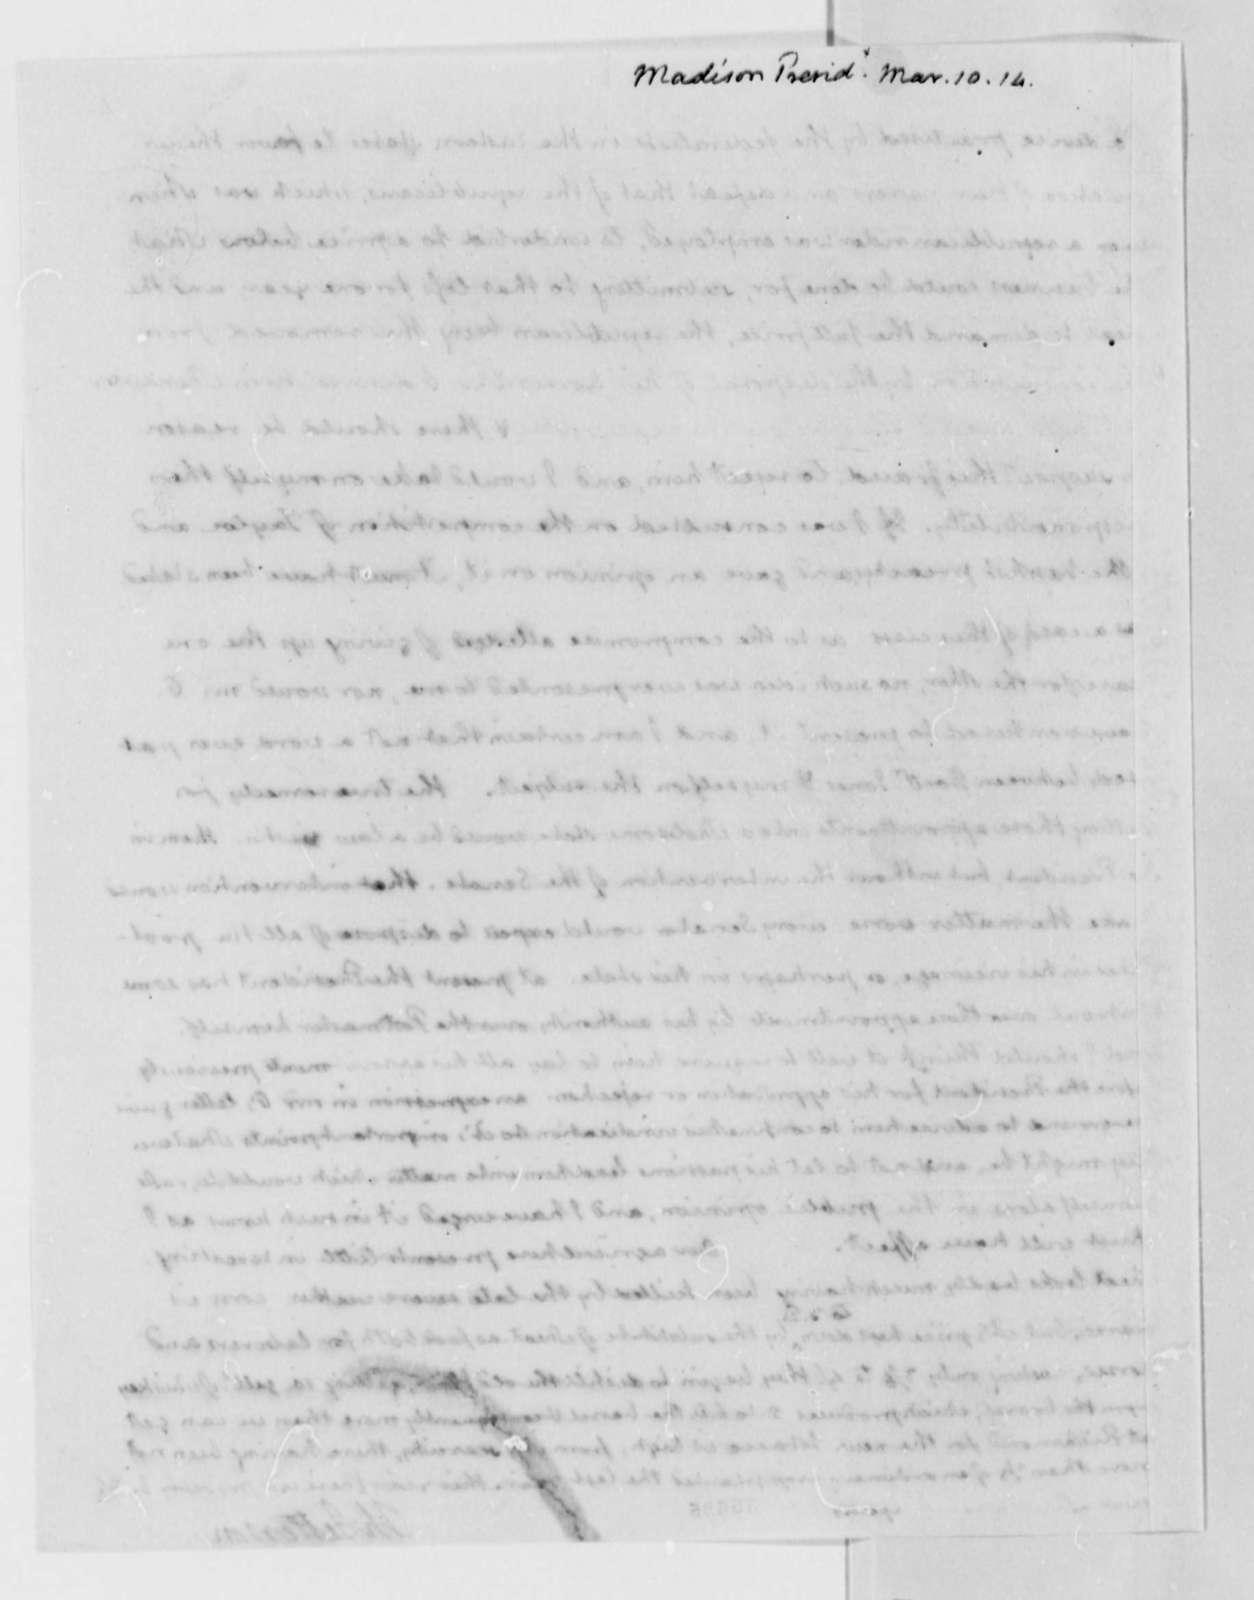 Thomas Jefferson to James Madison, March 10, 1814